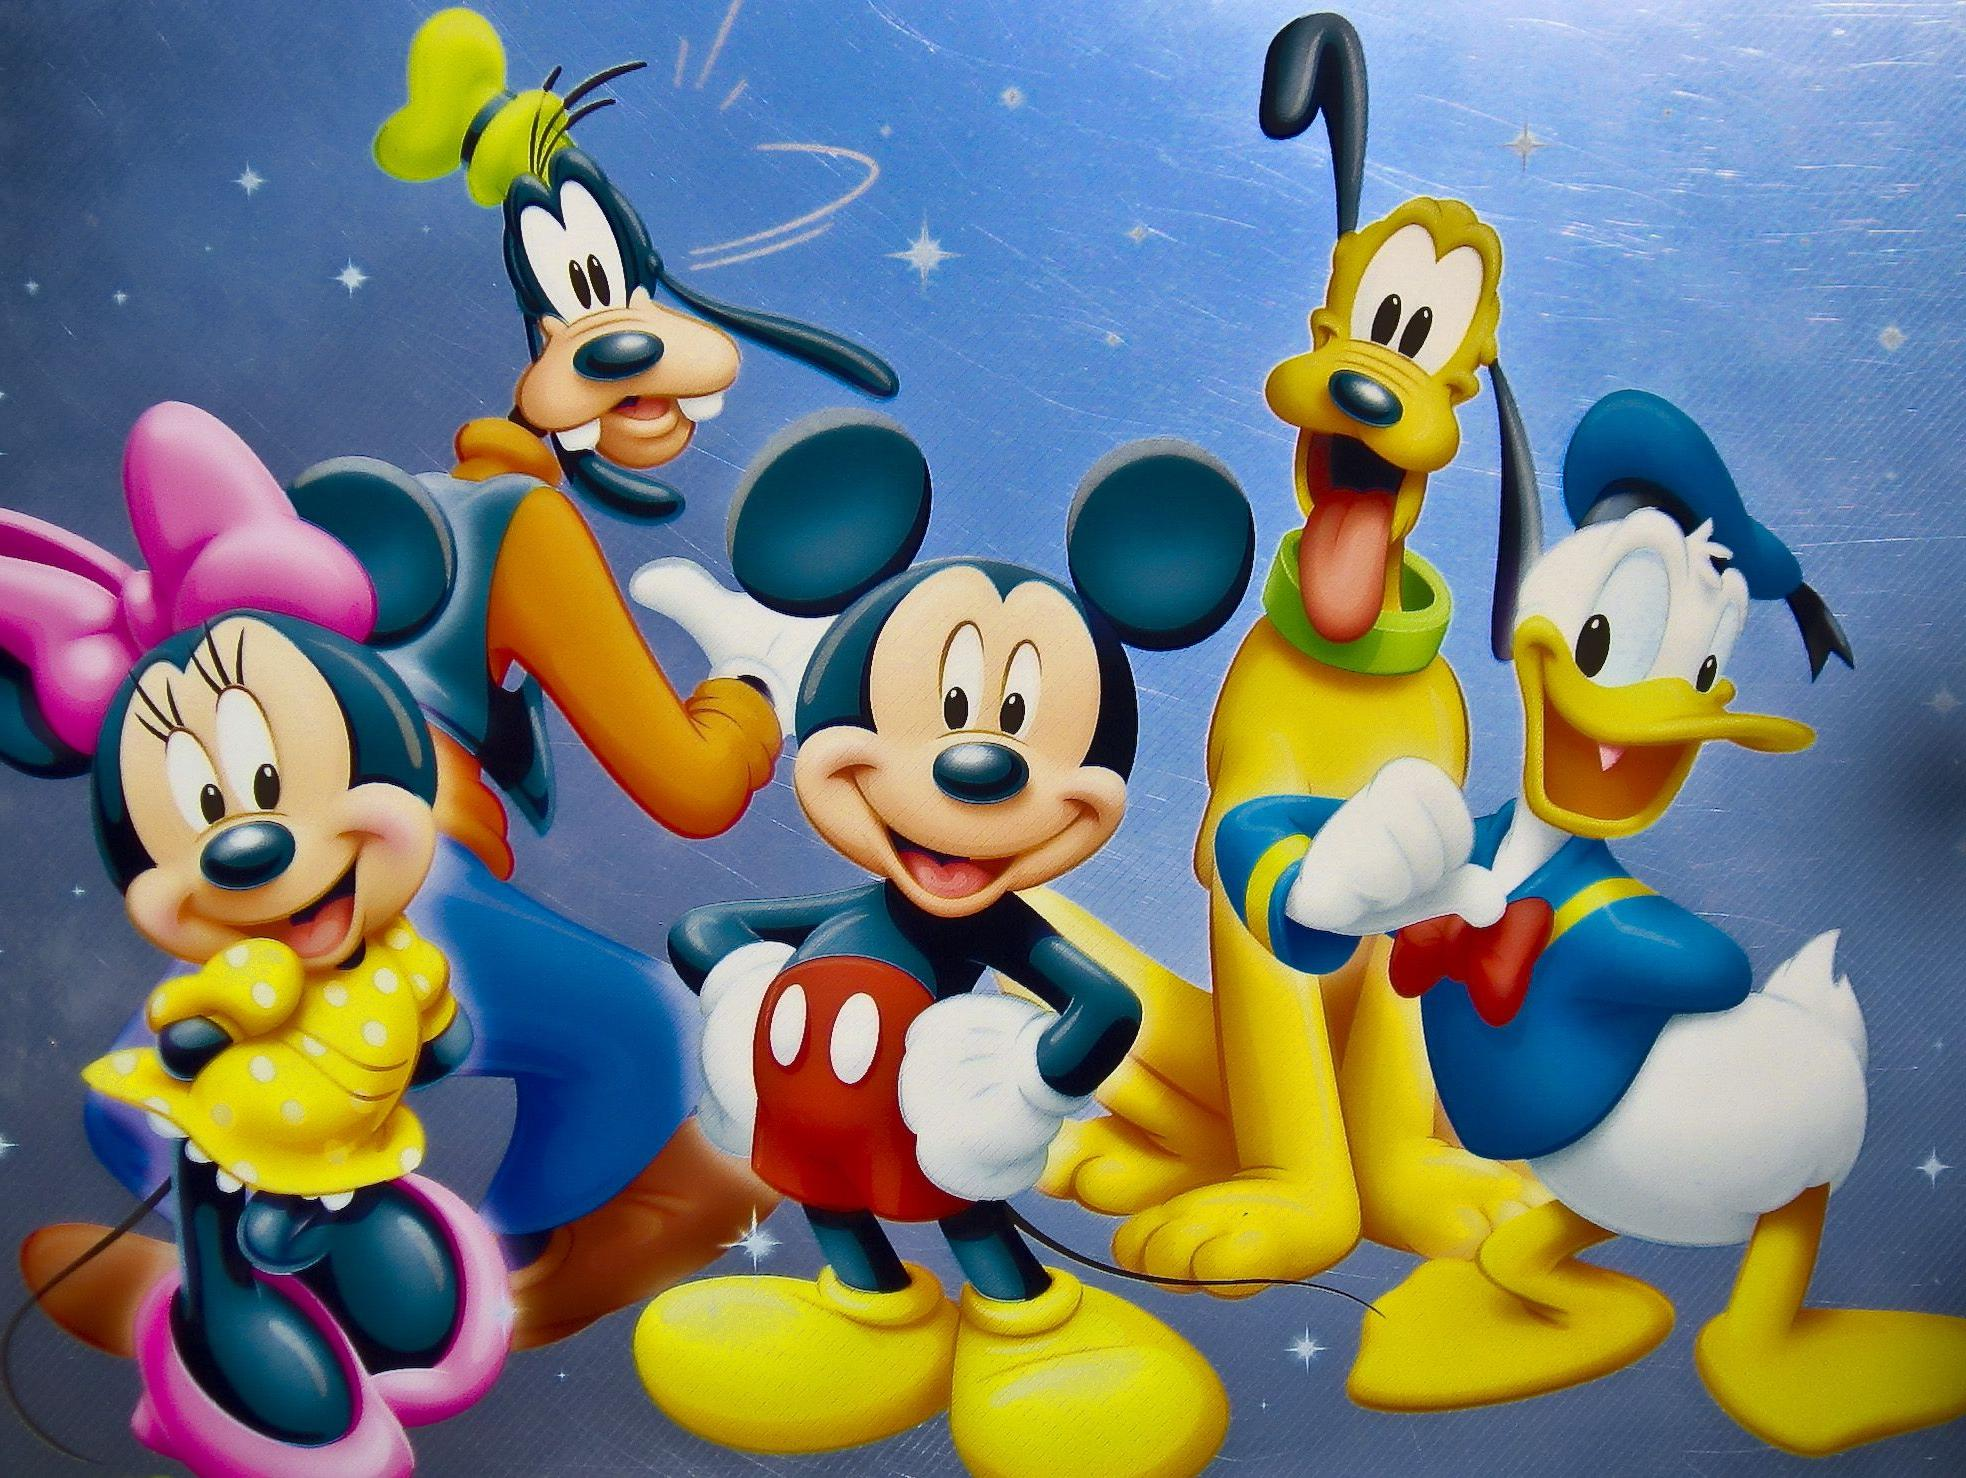 Disney Characters Desktop Wallpapers Top Free Disney Characters Desktop Backgrounds Wallpaperaccess